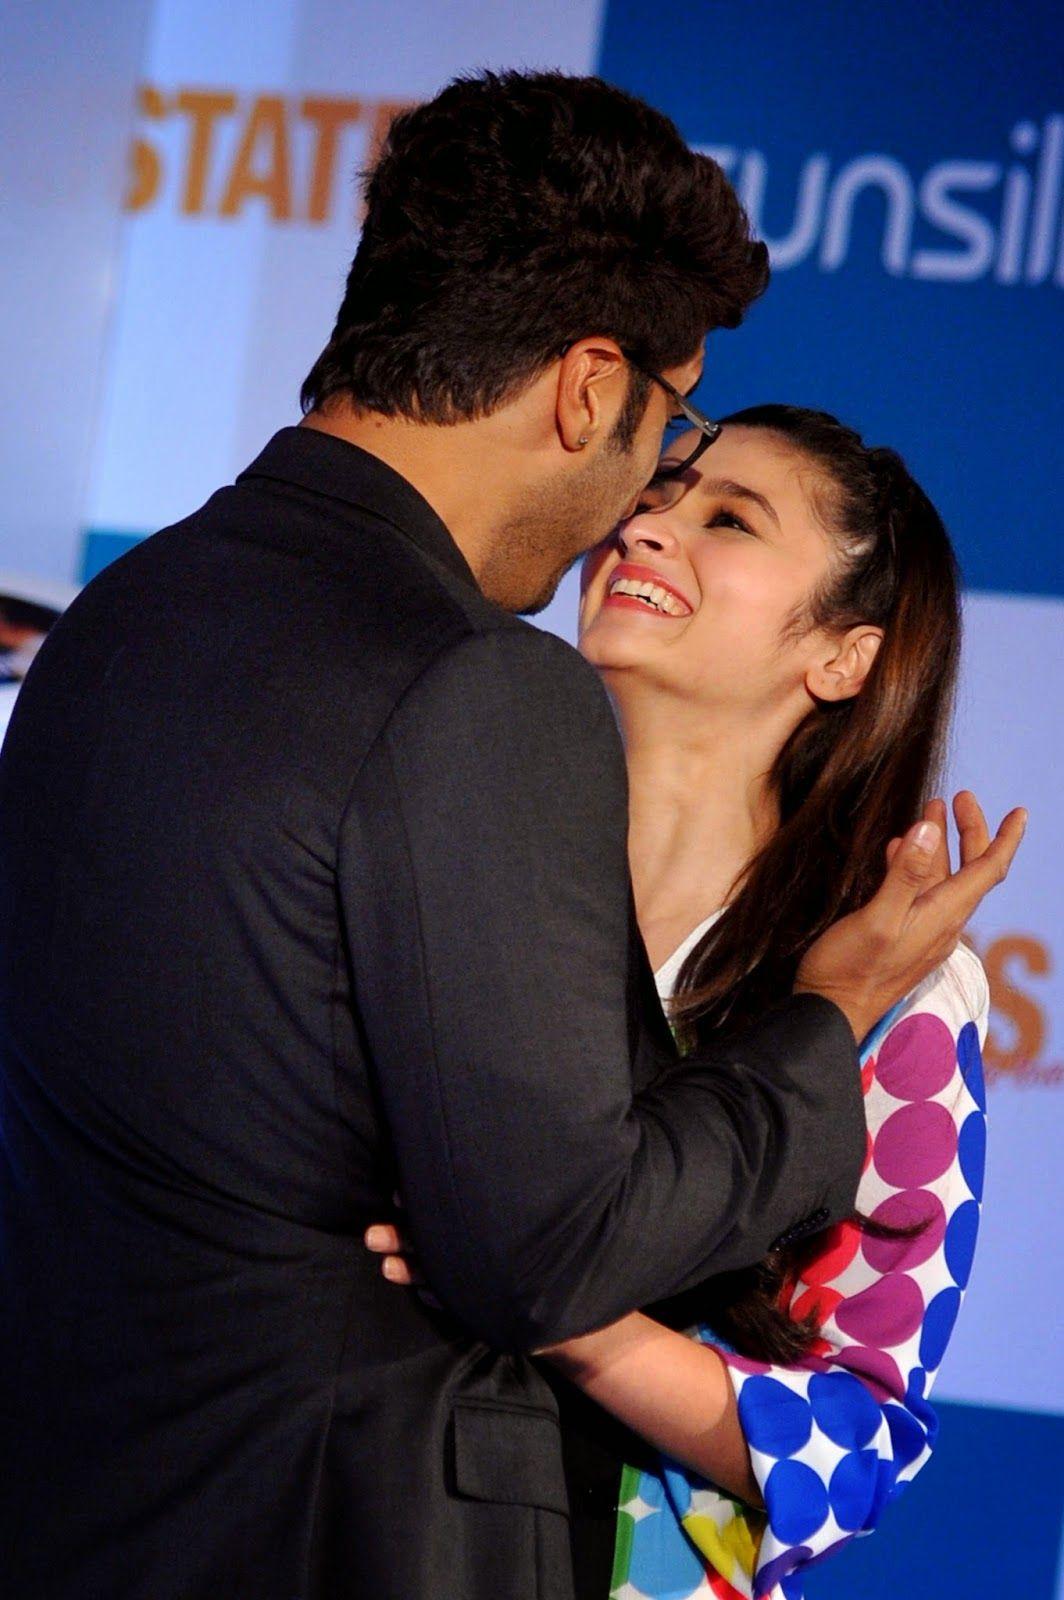 Indian Bollywood Film Actors Arjun Kapoor L And Alia Bhatt Pose